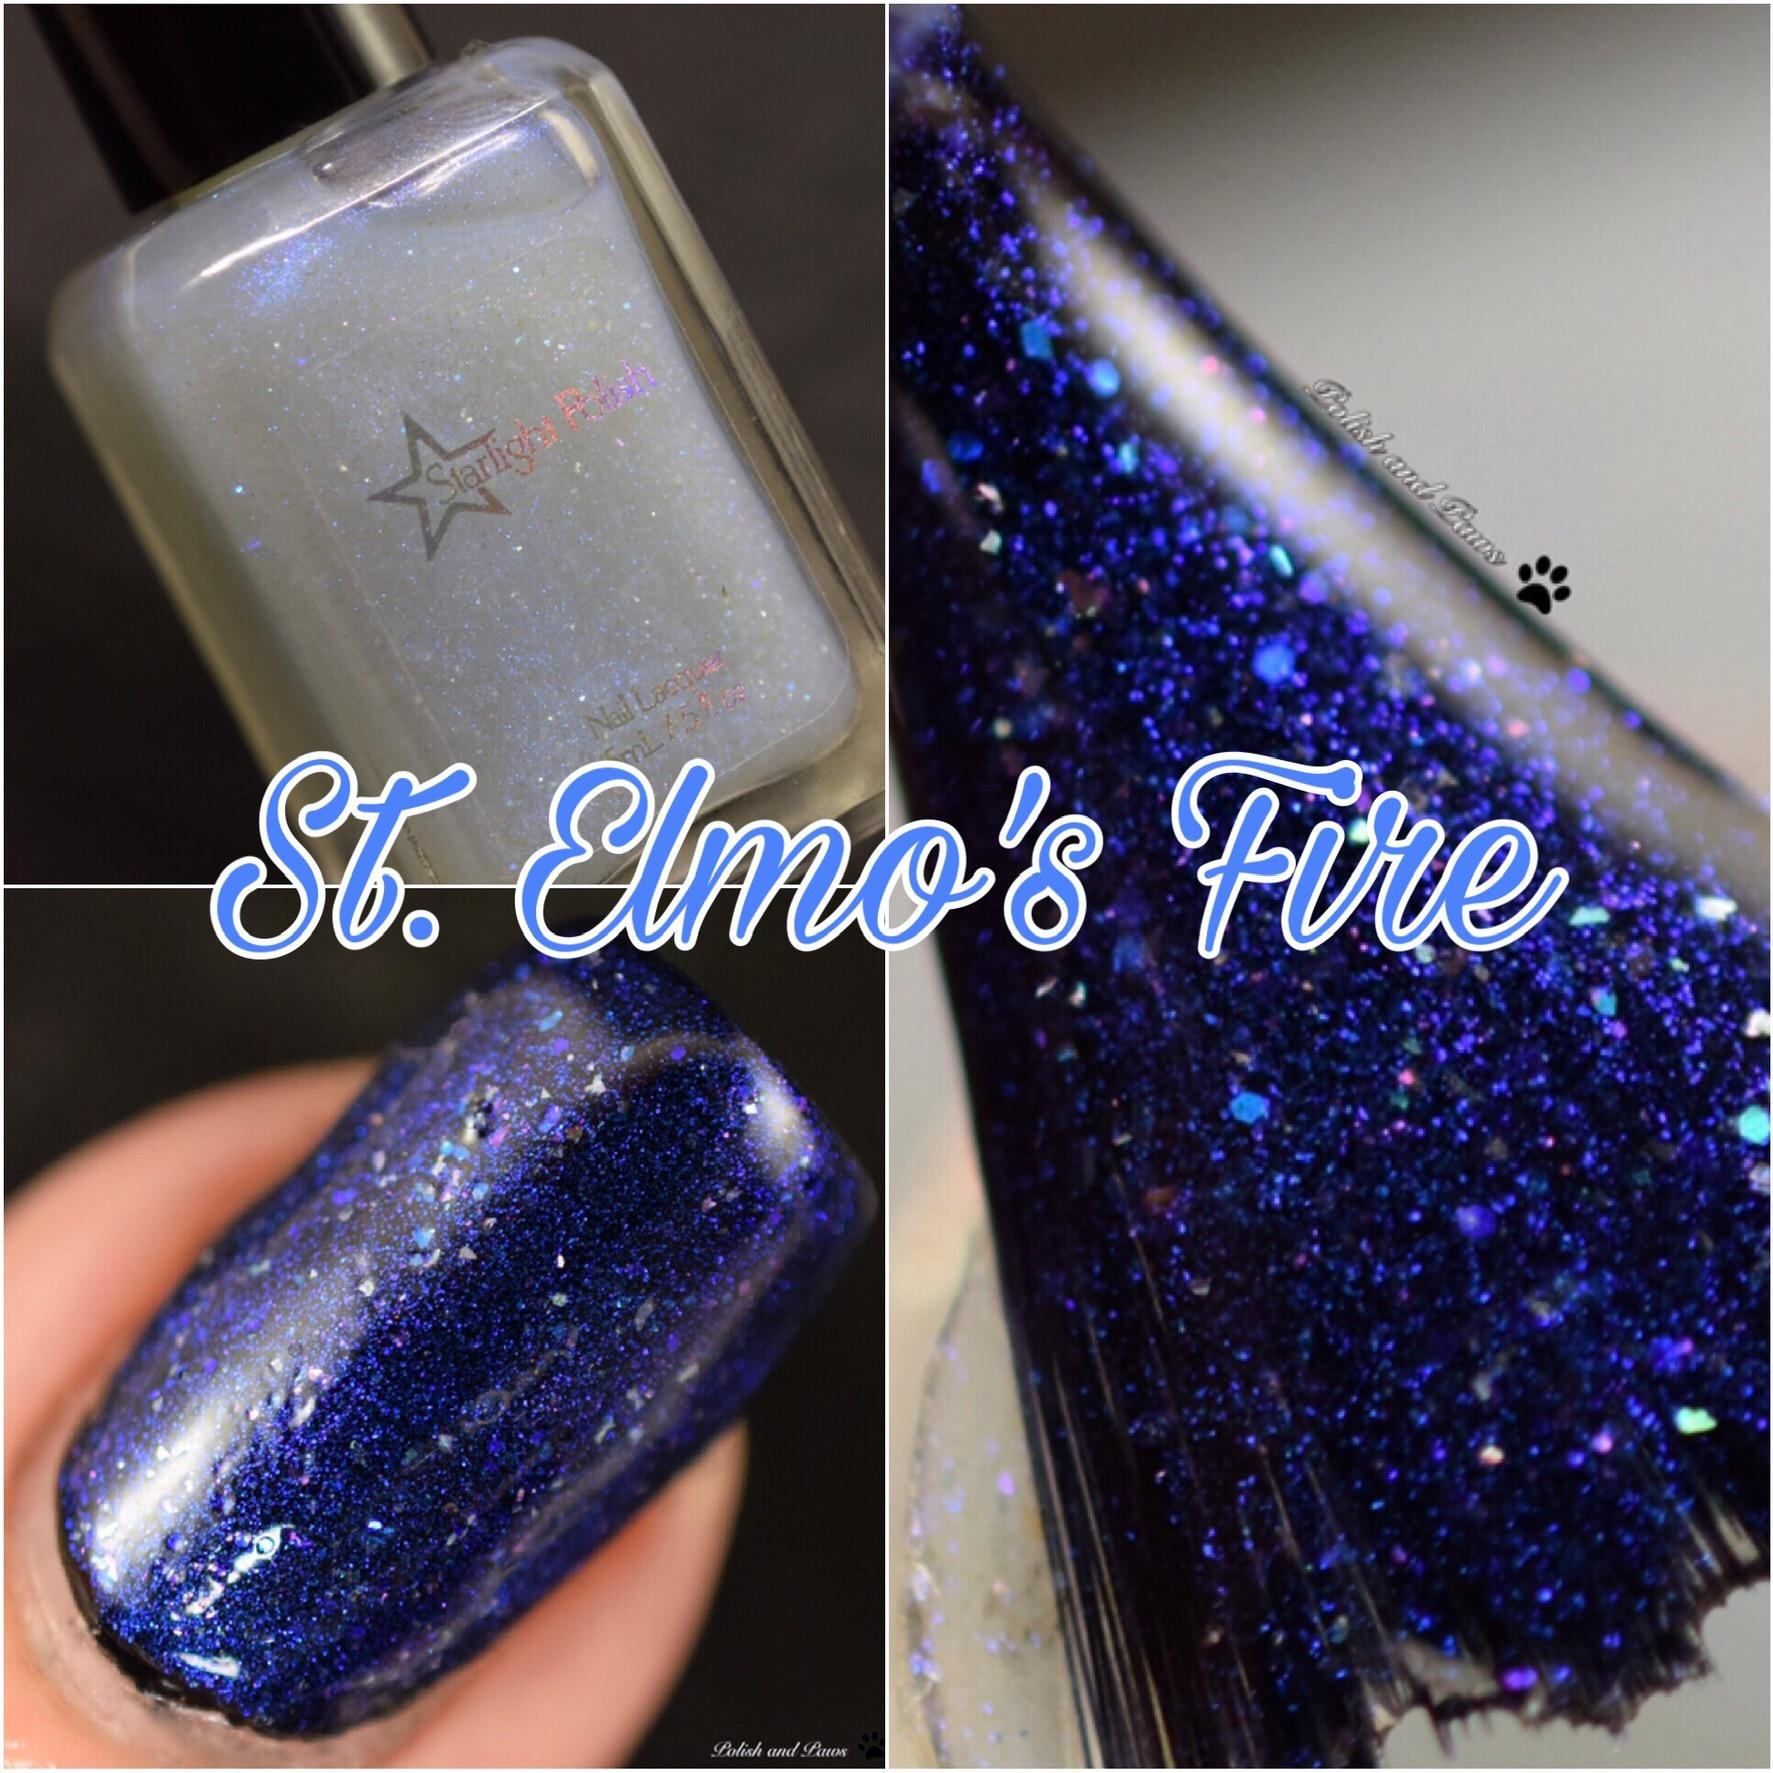 Starlight Nail Polish St Elmo's Fire